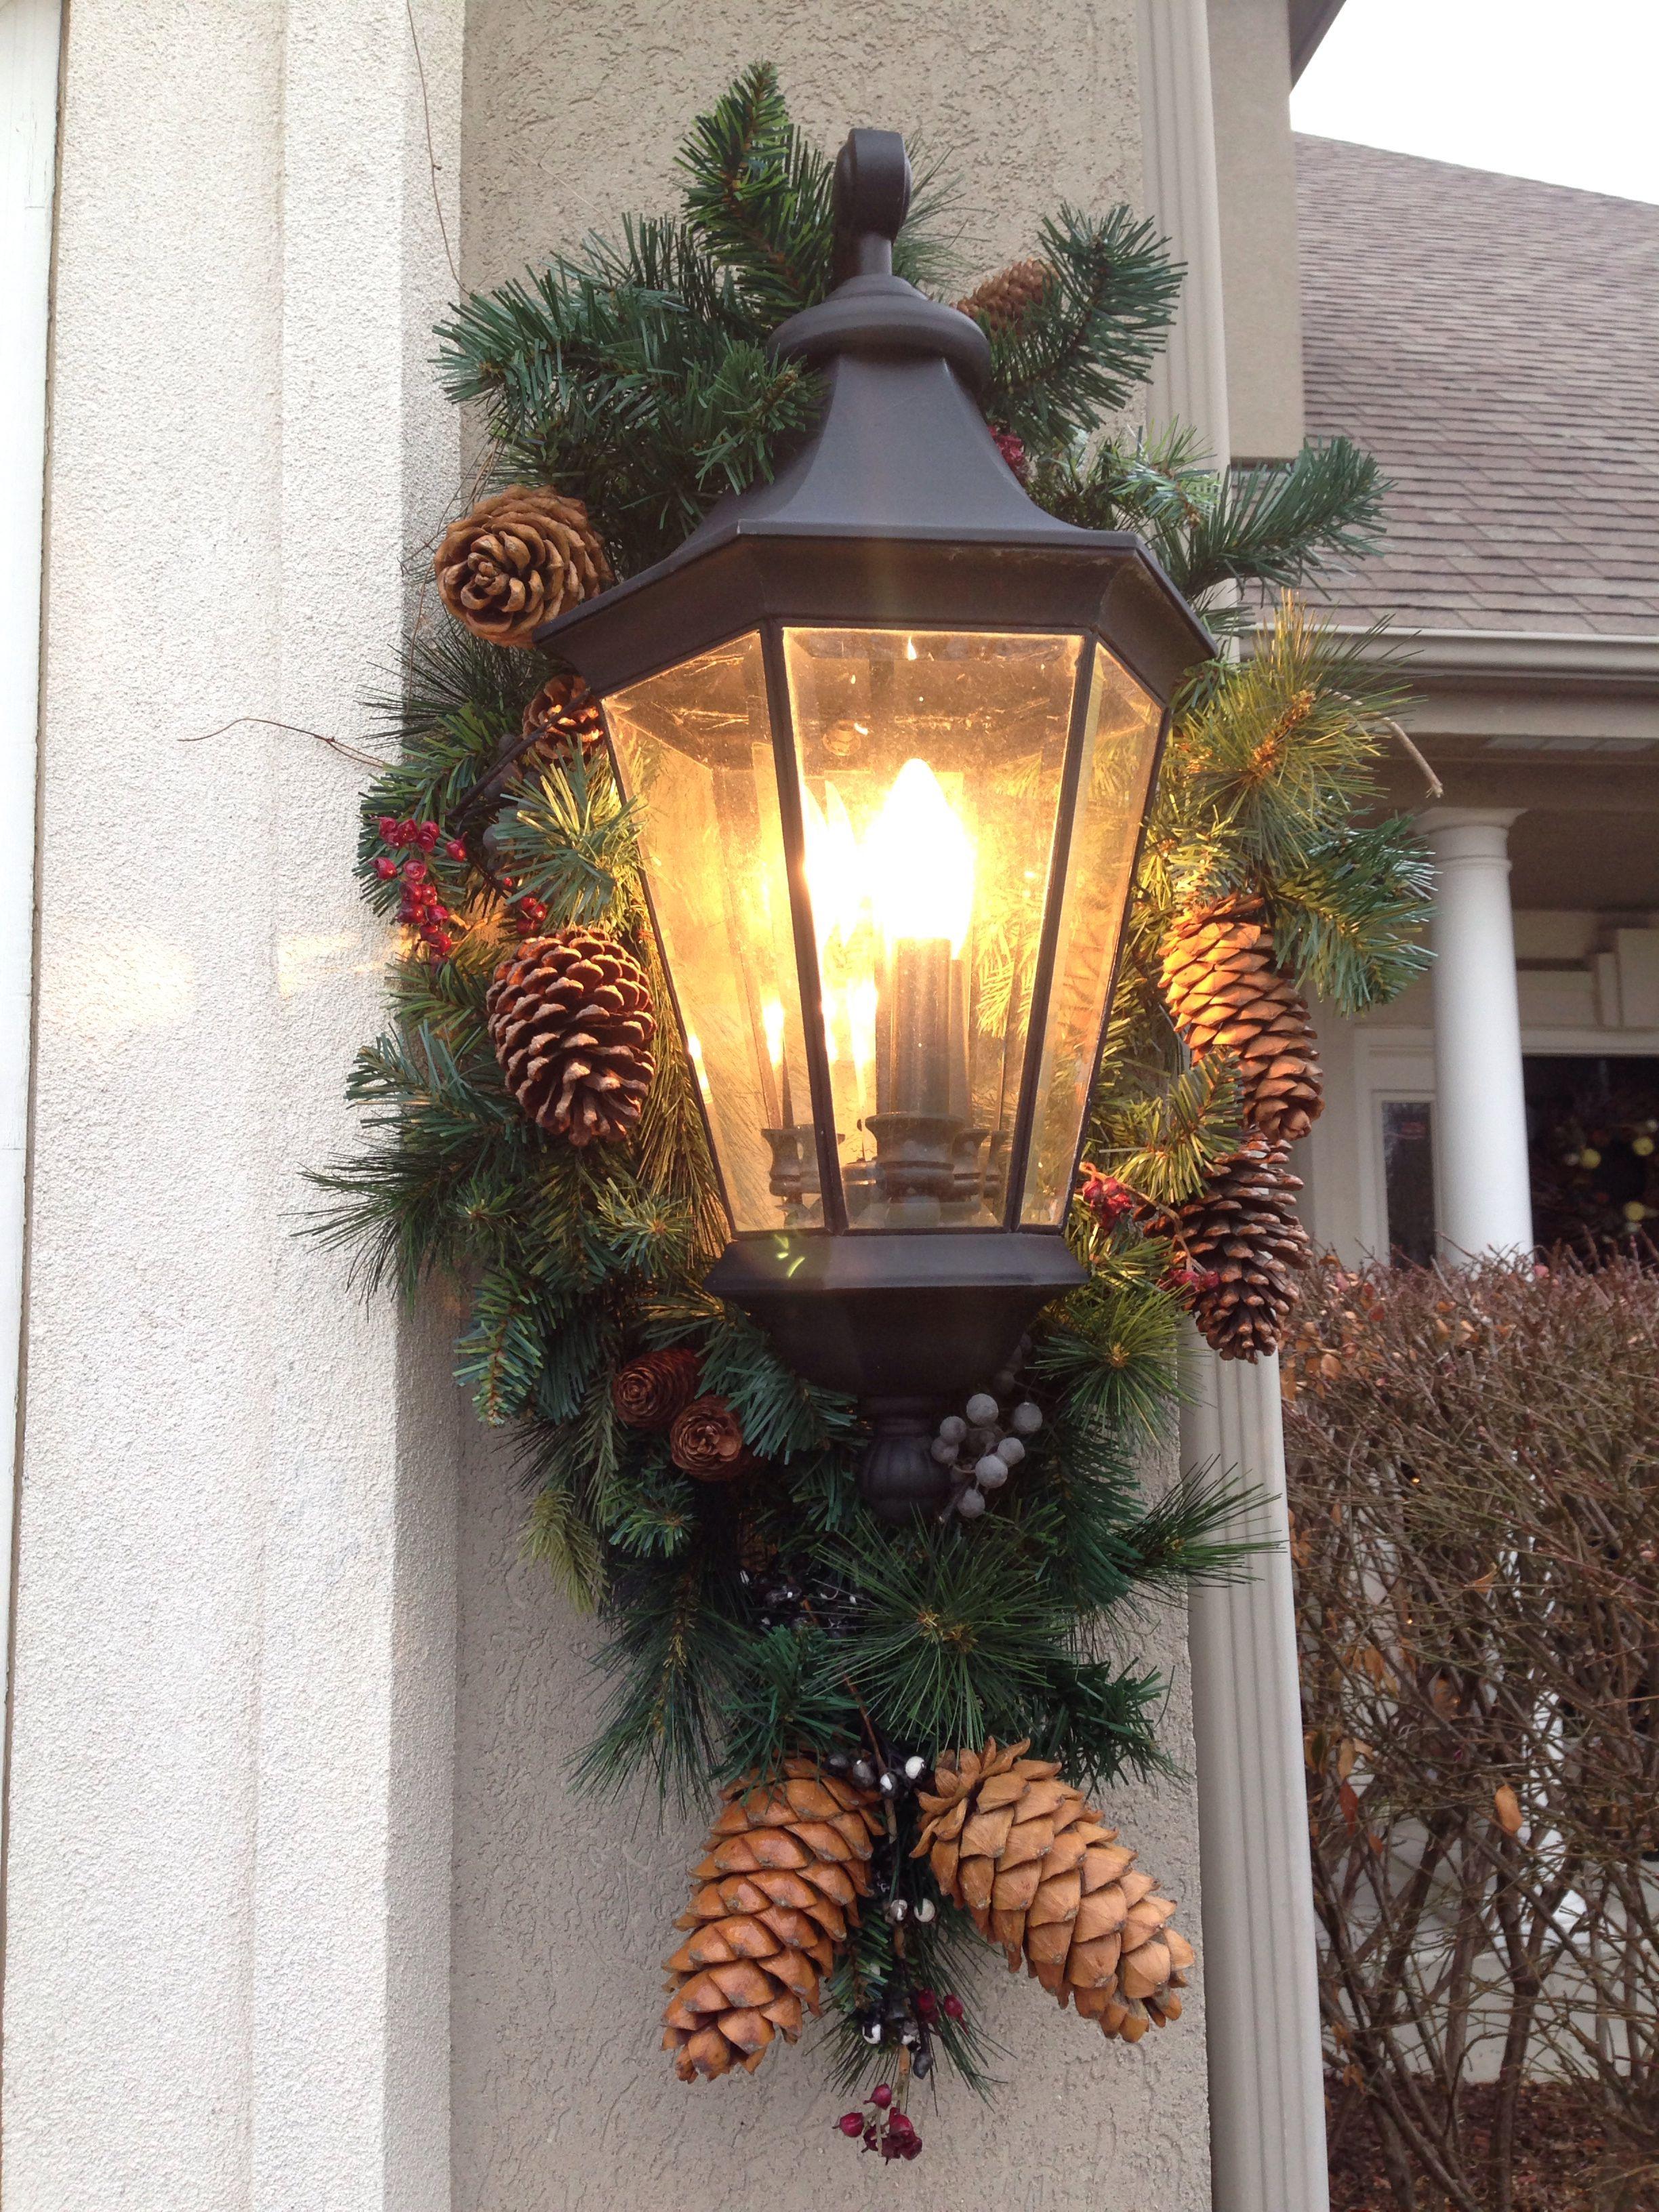 Christmas Coach Light Decorations Outdoor Christmas Decorations Christmas Decorations Dollar Store Christmas